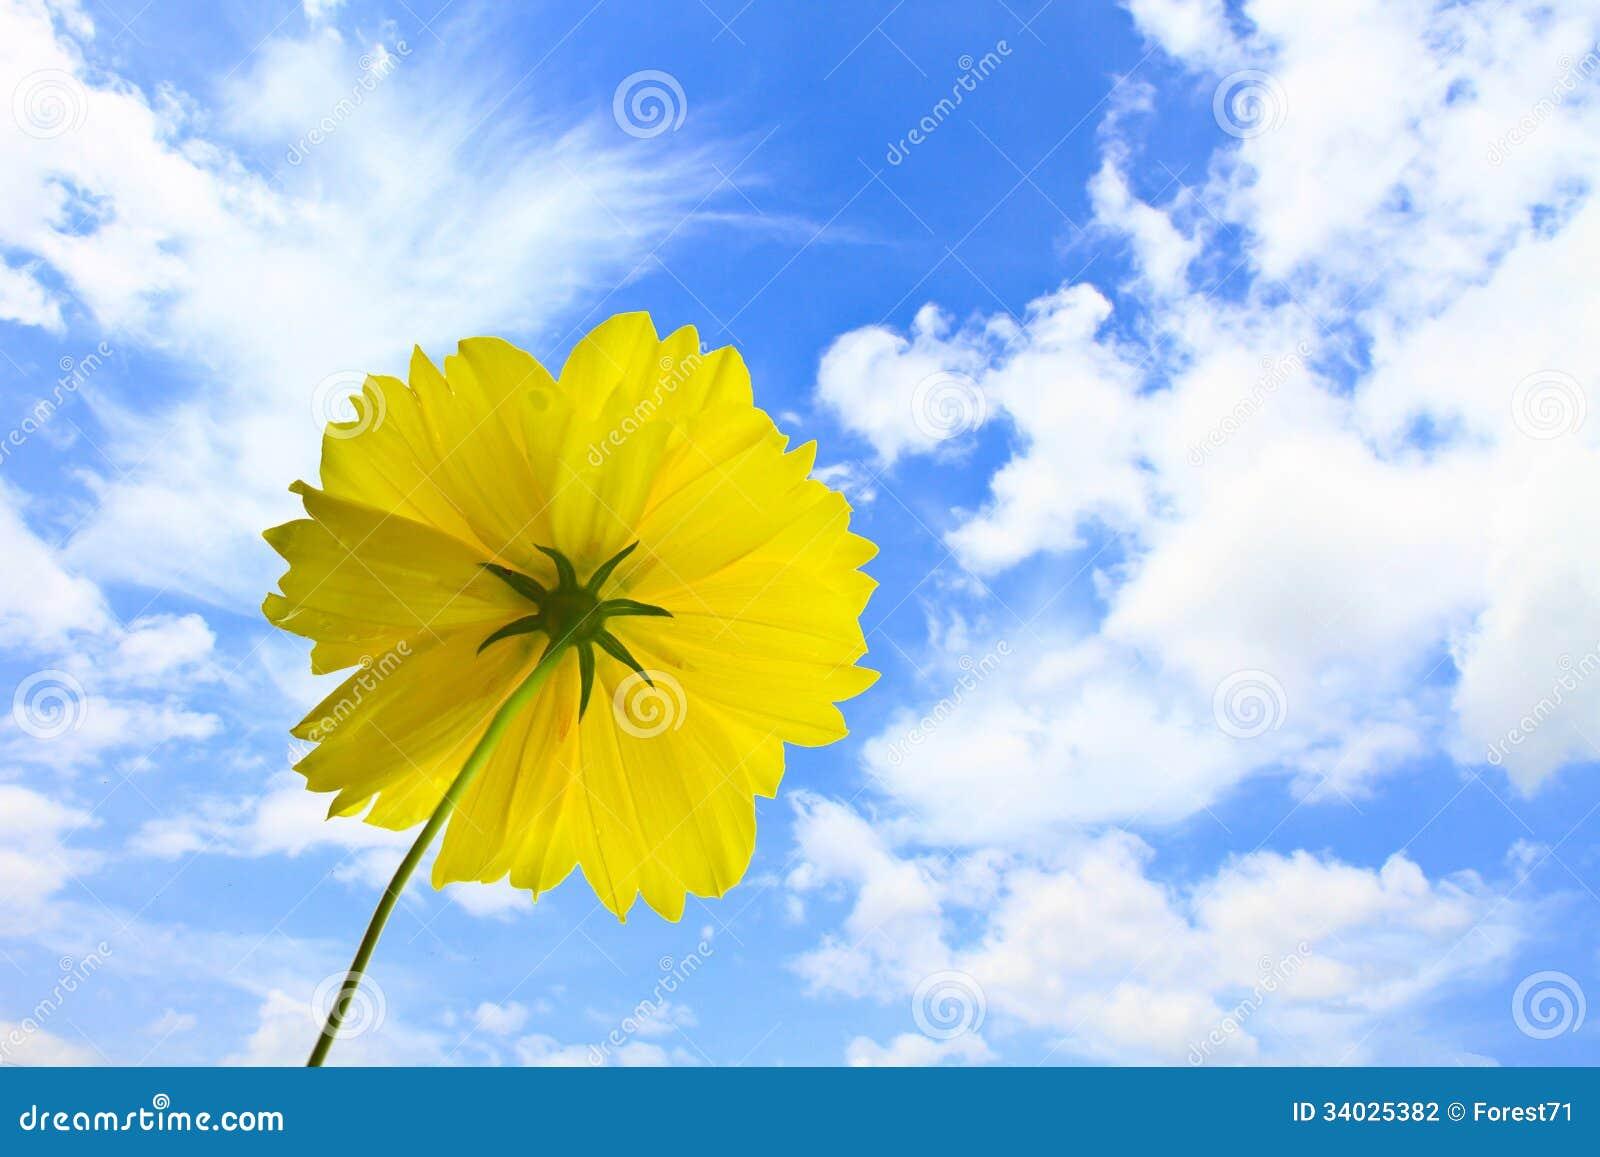 Marigold flowers on blue sky background stock photography image